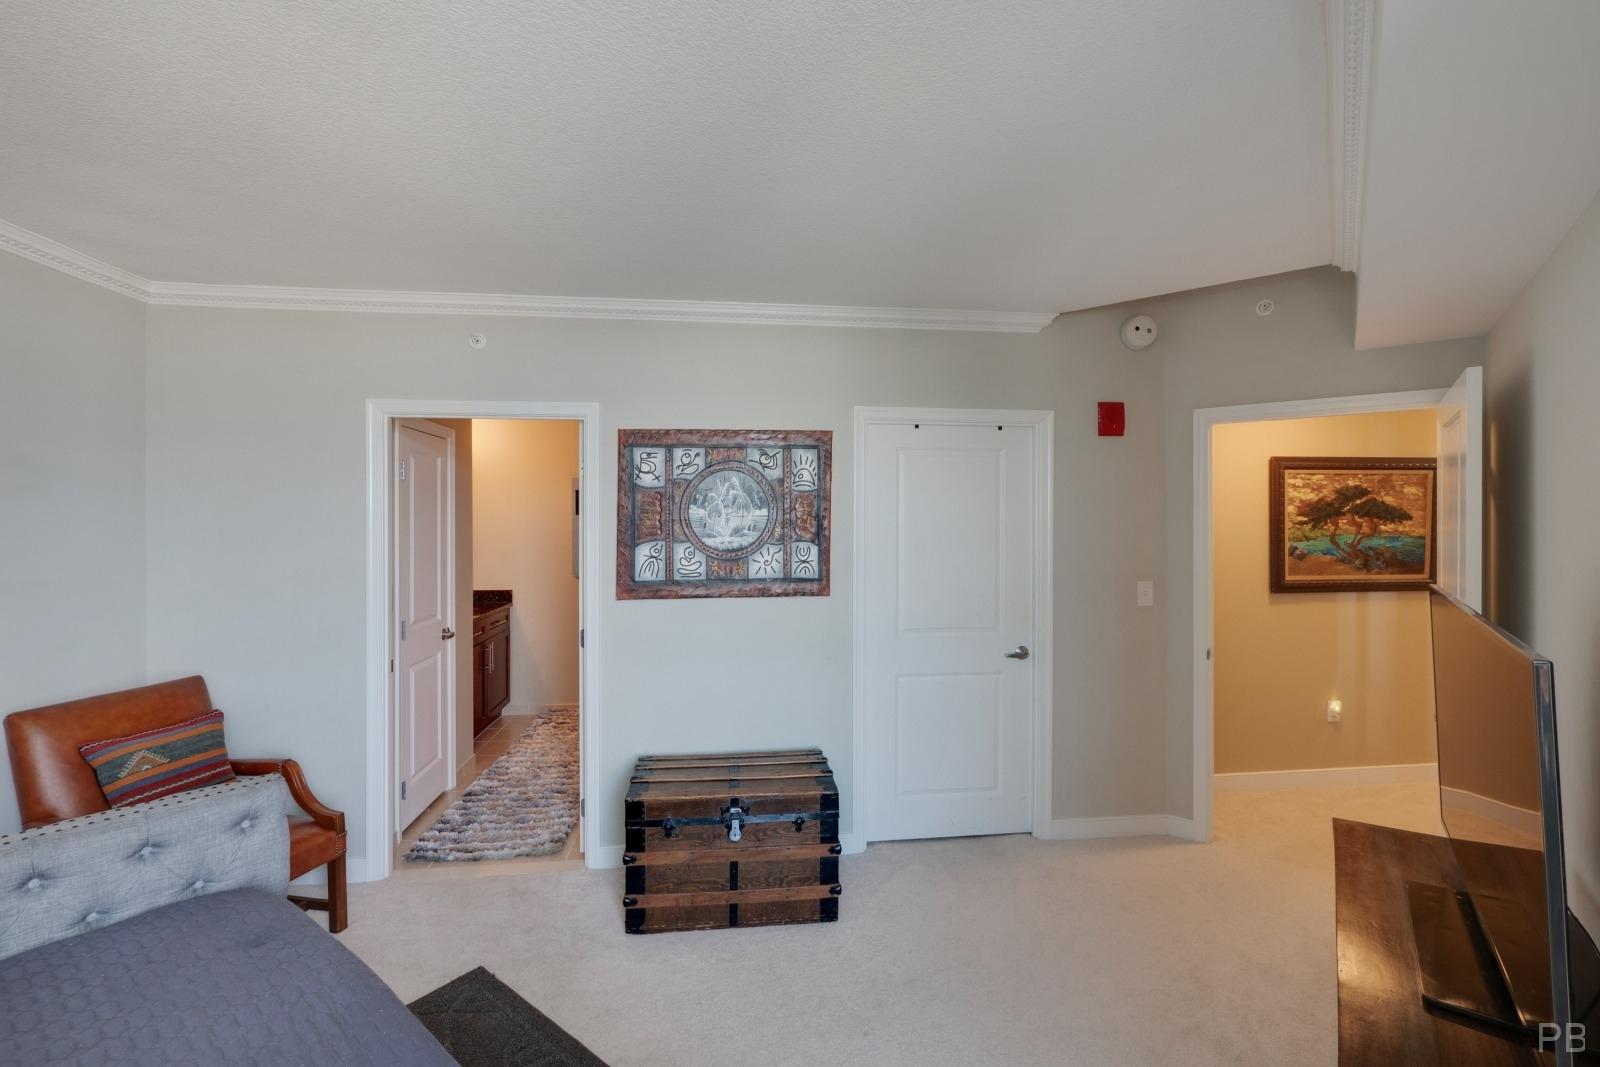 2nd bedroom has its own huge walk-in closet and bathroom